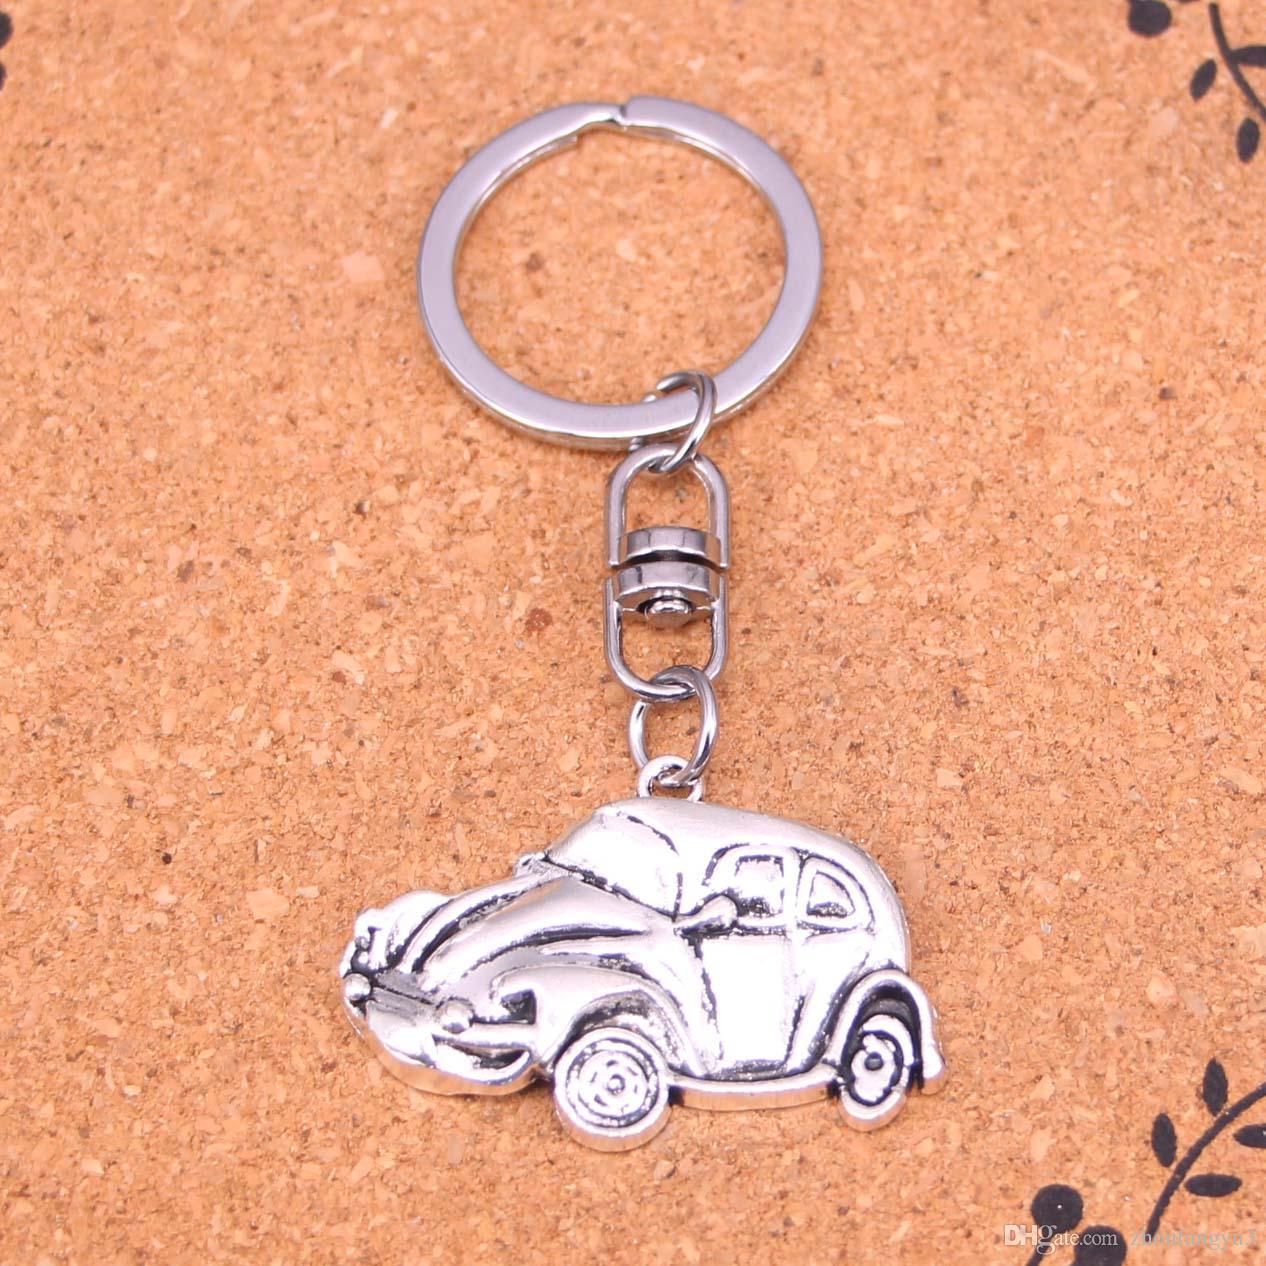 New Design Car Vw Bug Beetle Herbie Keychain Car Key Chain Key Ring Silver  Pendant For Man Women Gift UK 2019 From Zhoufangyu3 00c9c584c2